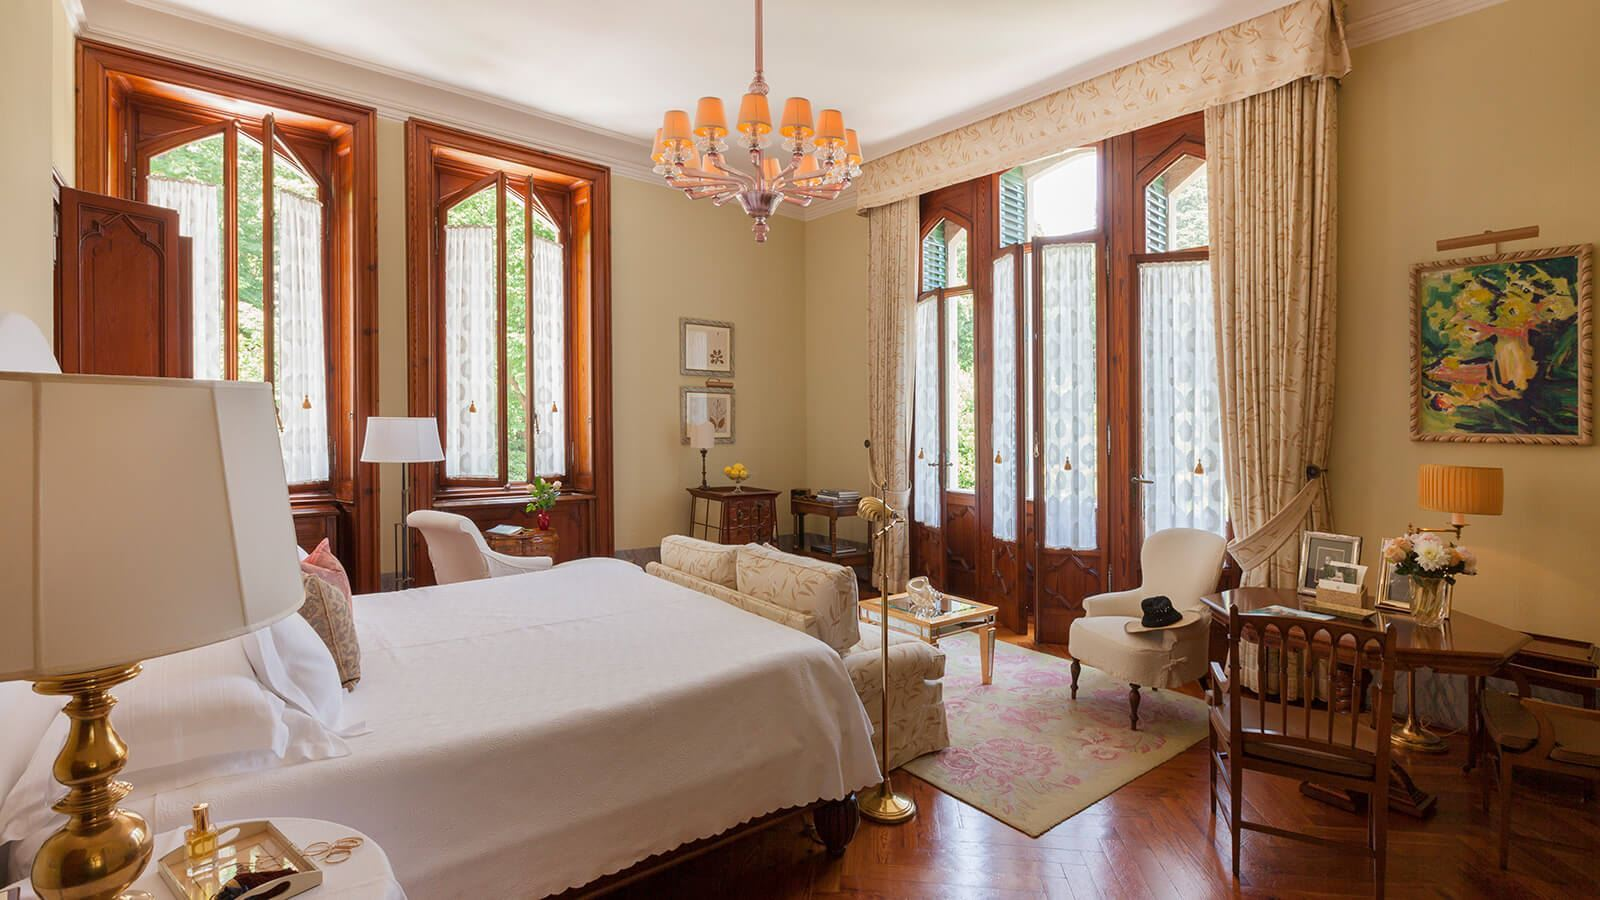 Grand-Hotel-Villa-Feltrinelli-Guest-Rooms-05